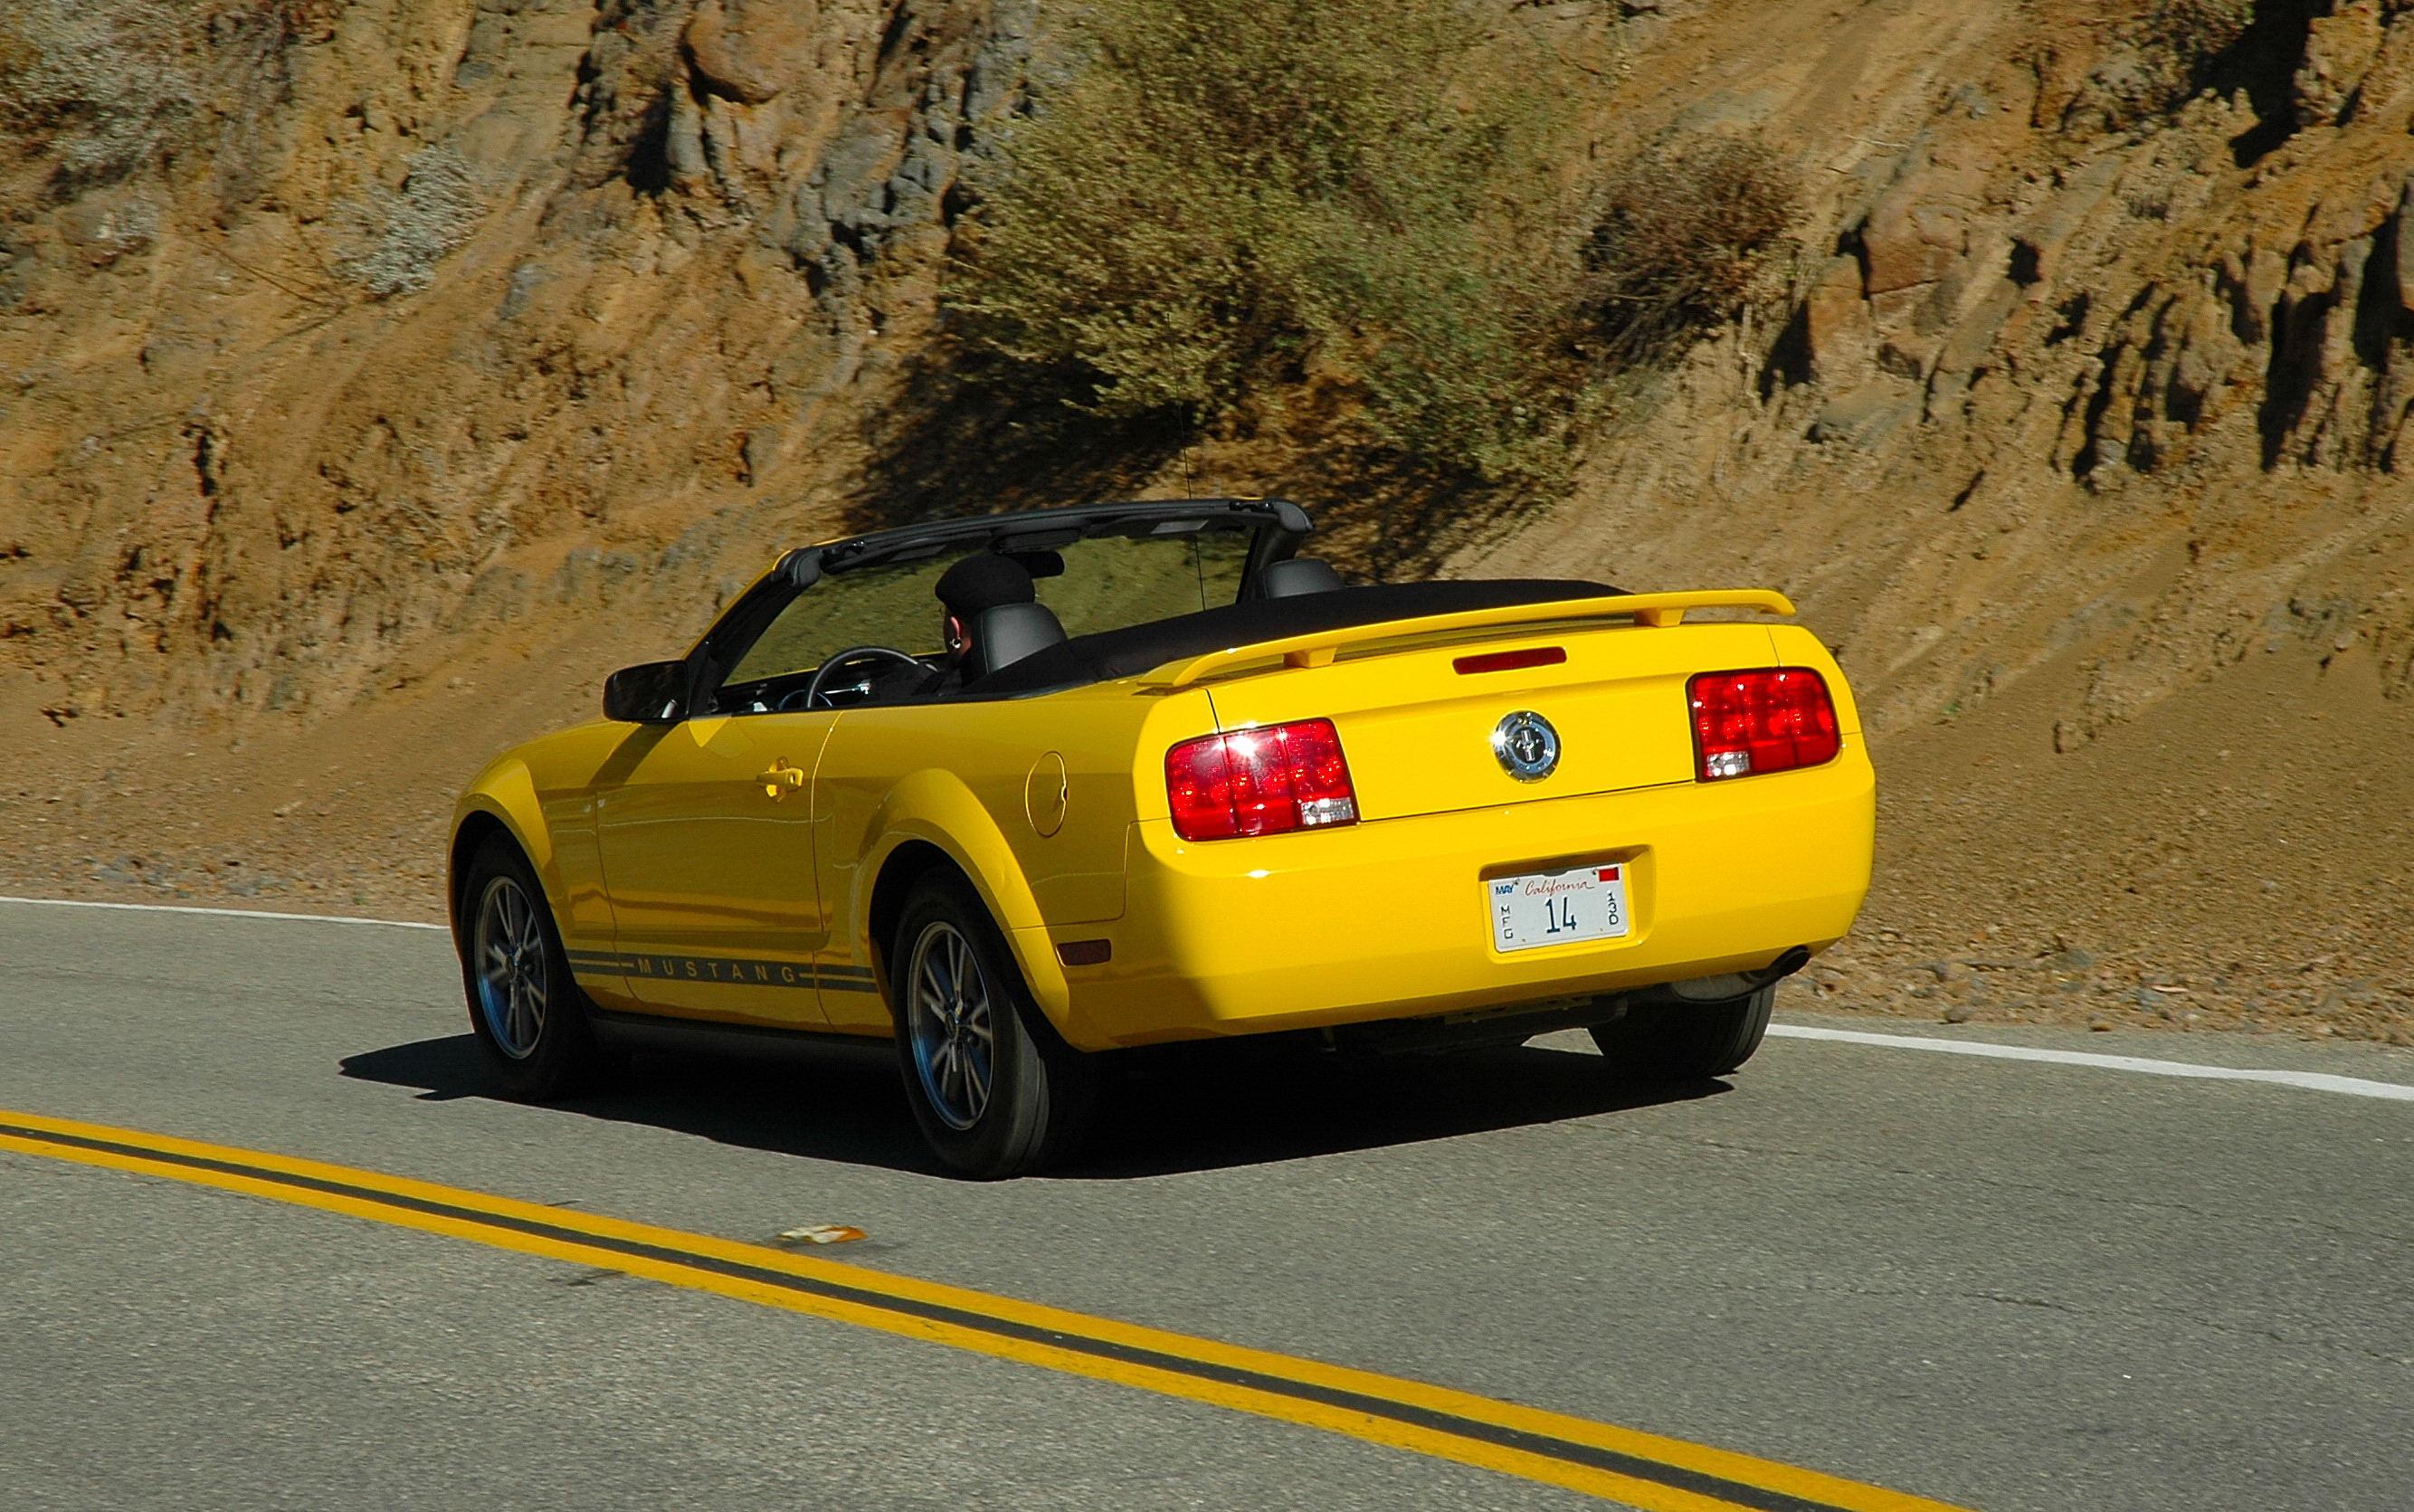 Ford Mustang V6 Convertible